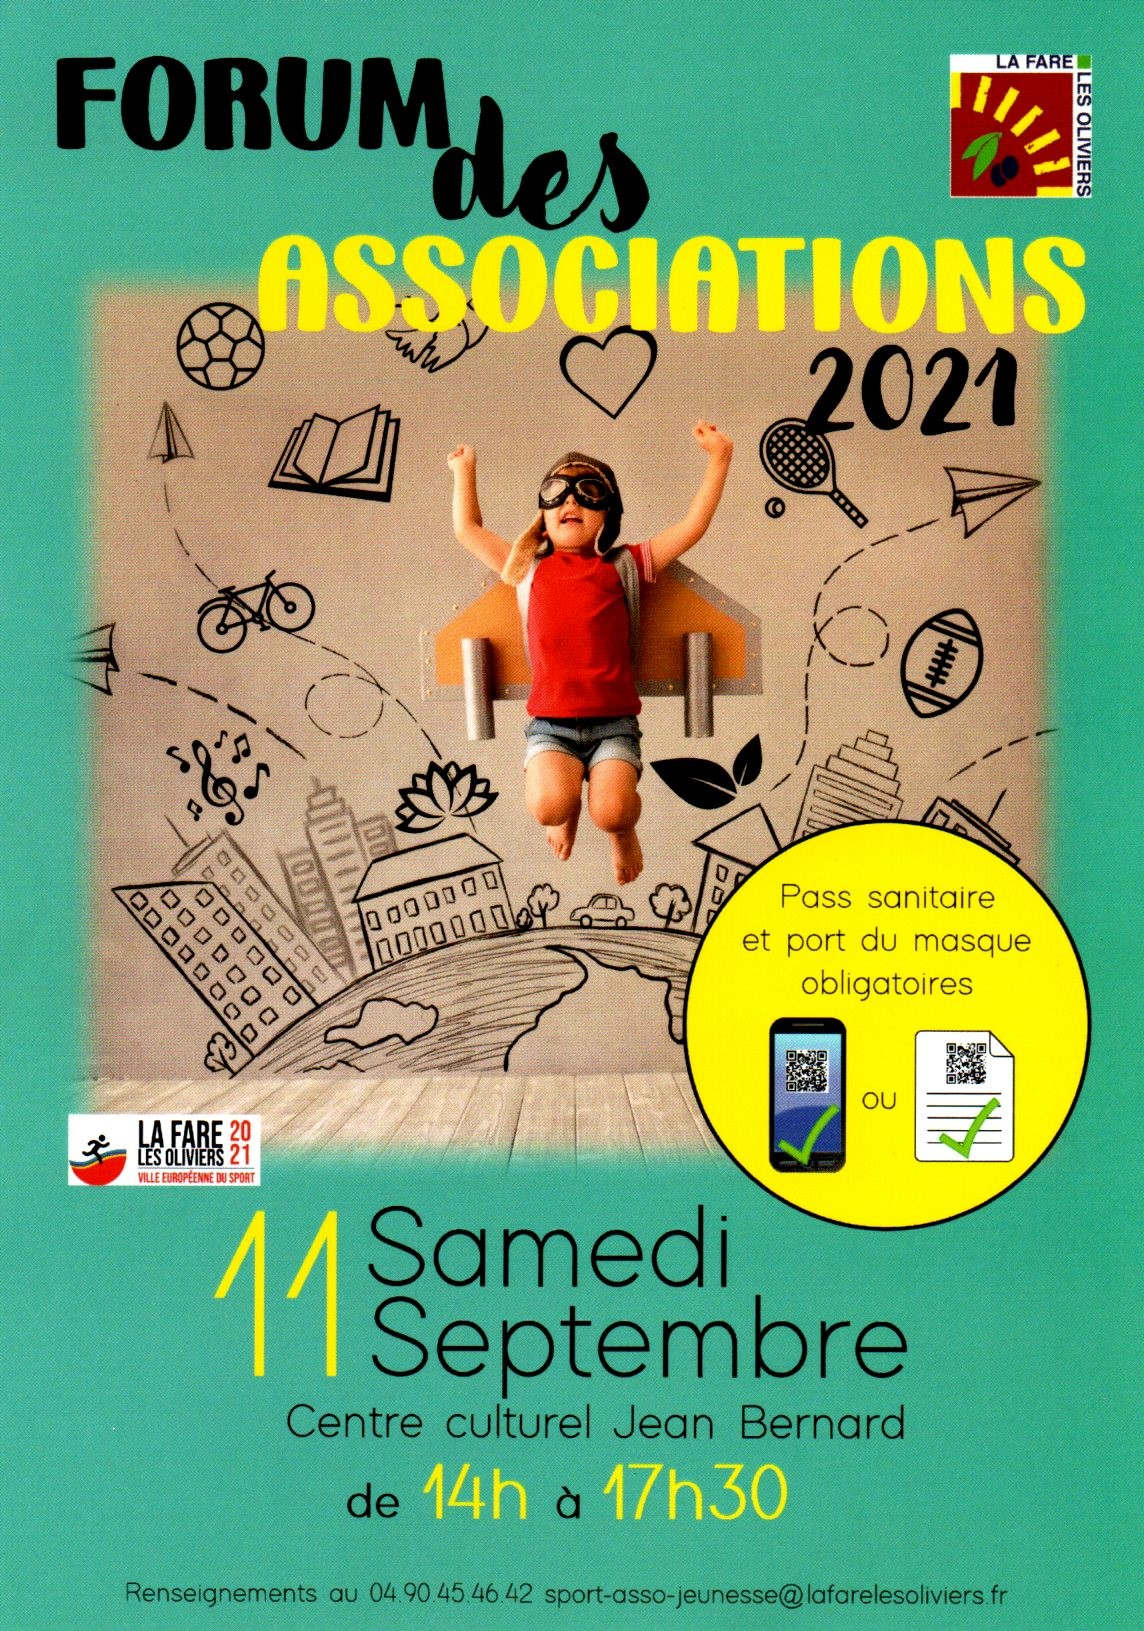 ForumAssociationsLaFare2021.jpg